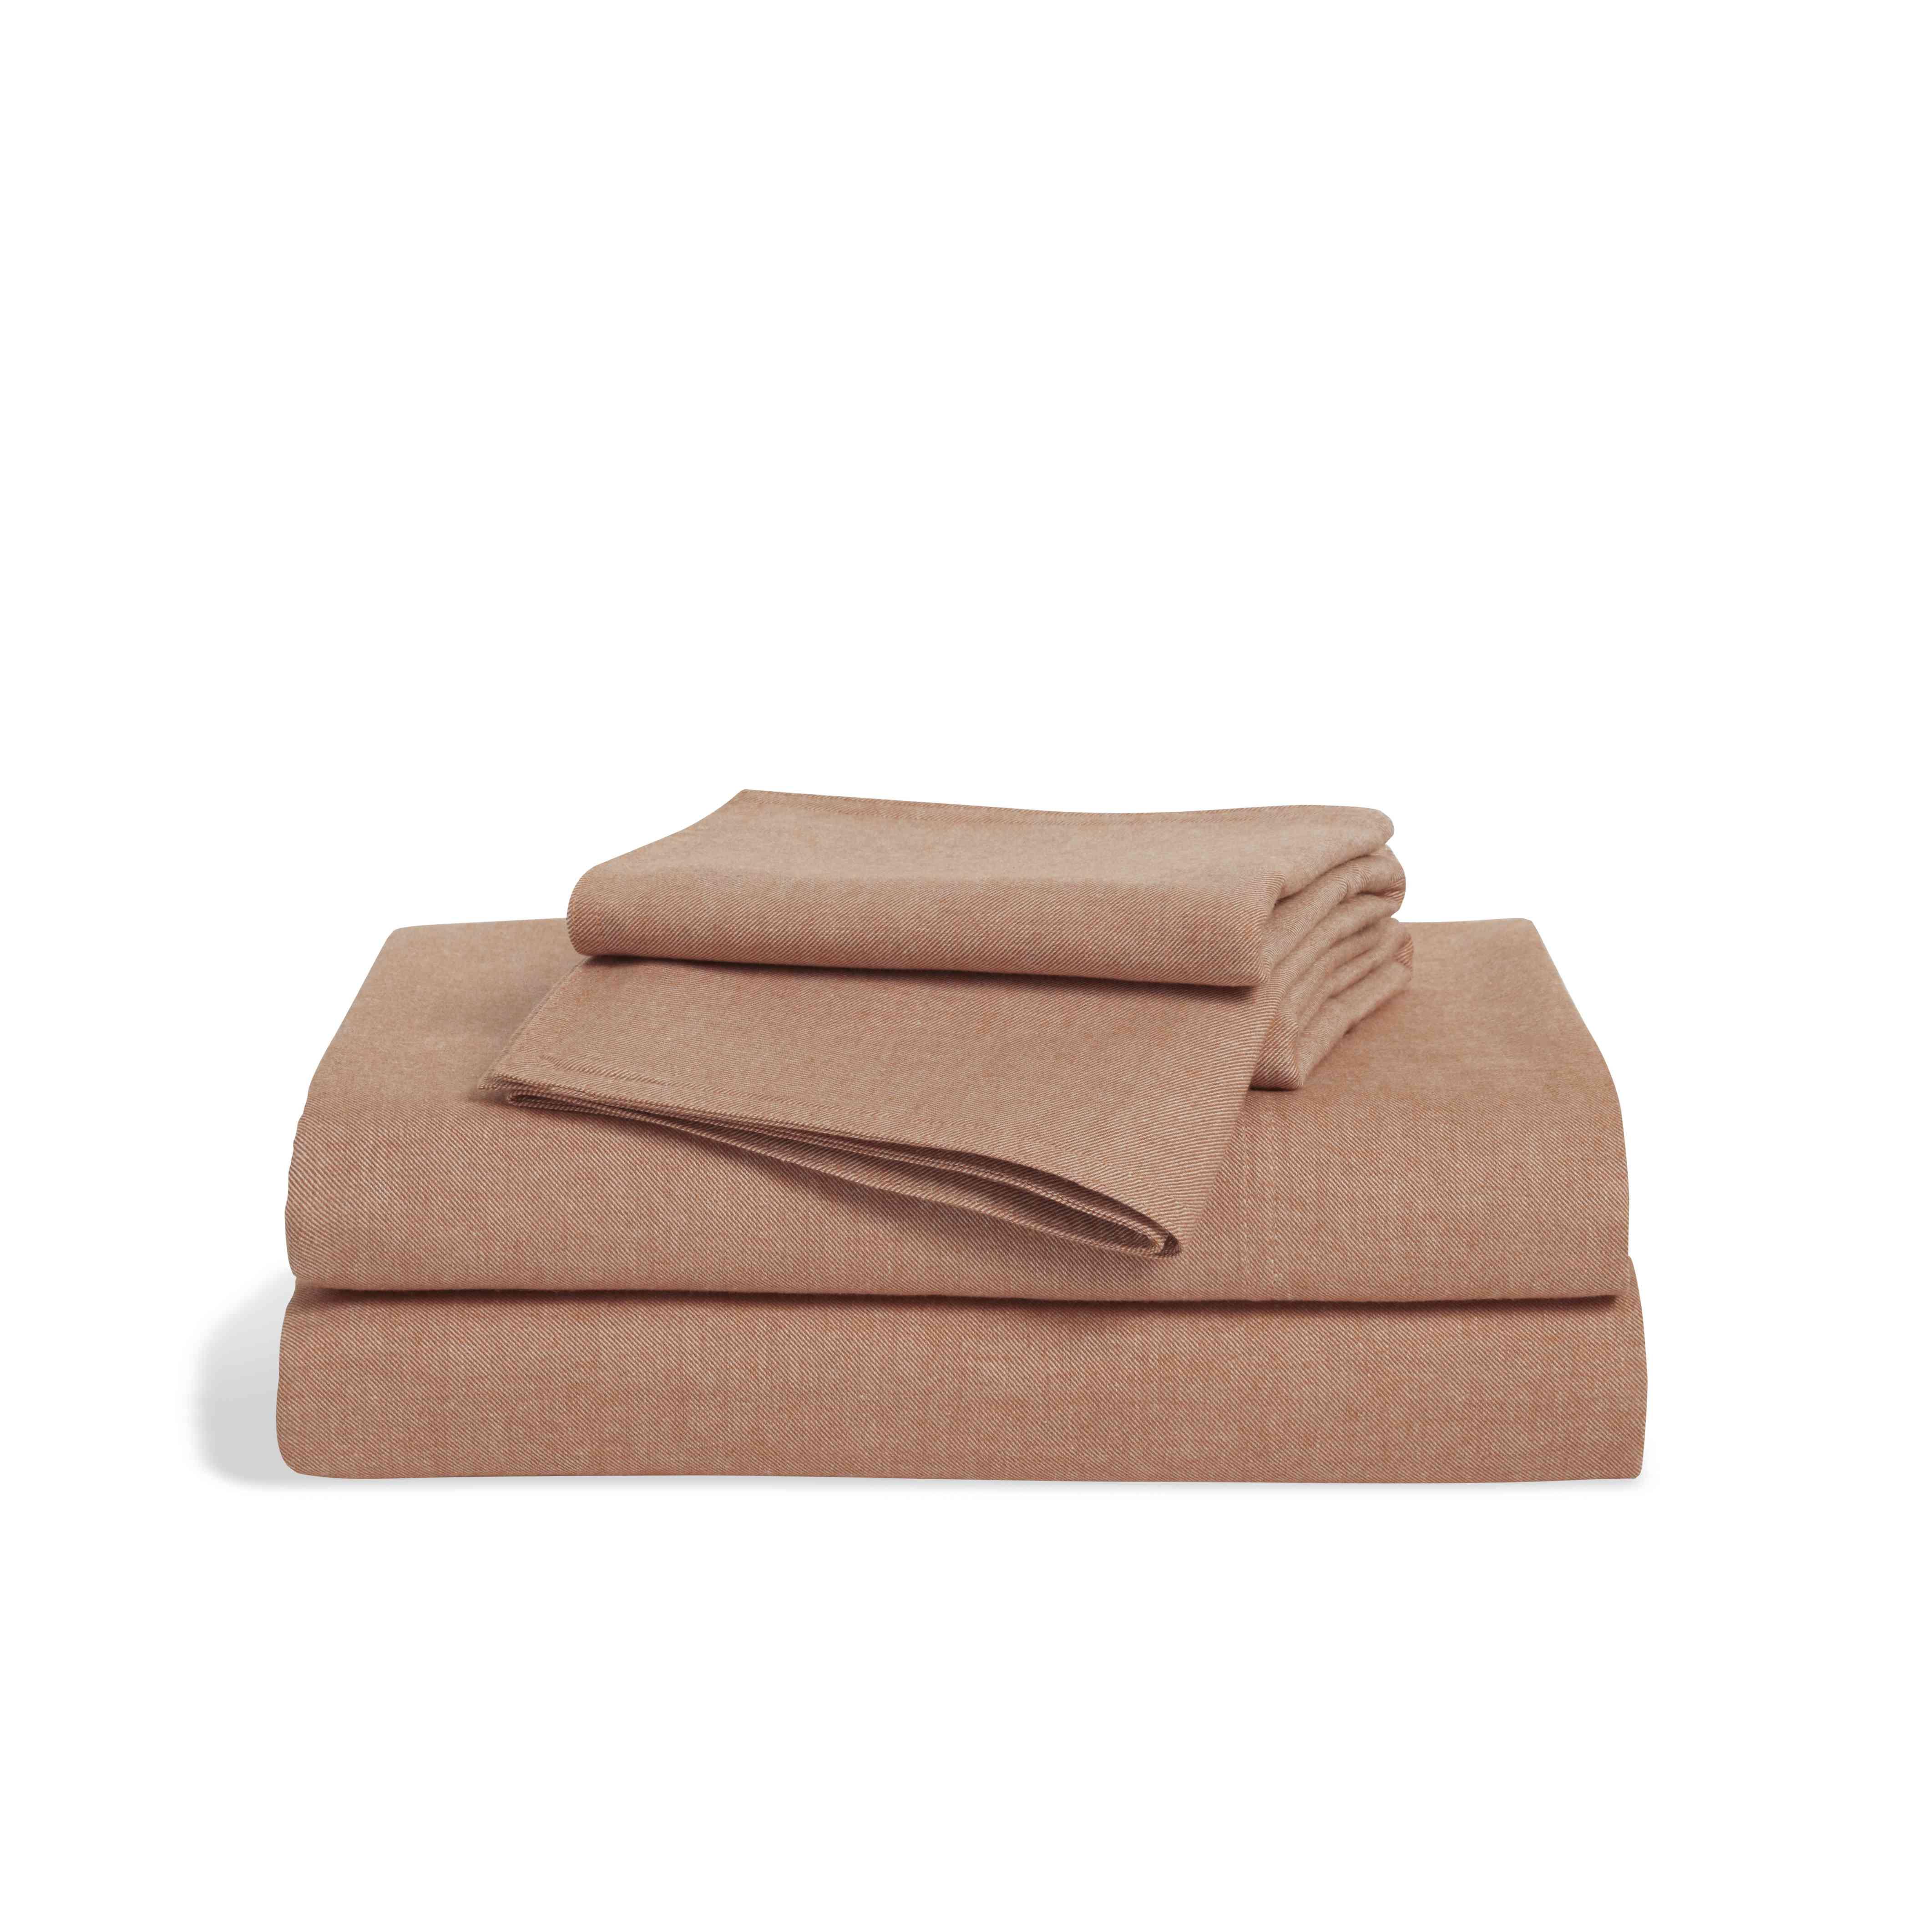 Rust Heathered Cashmere Sheet